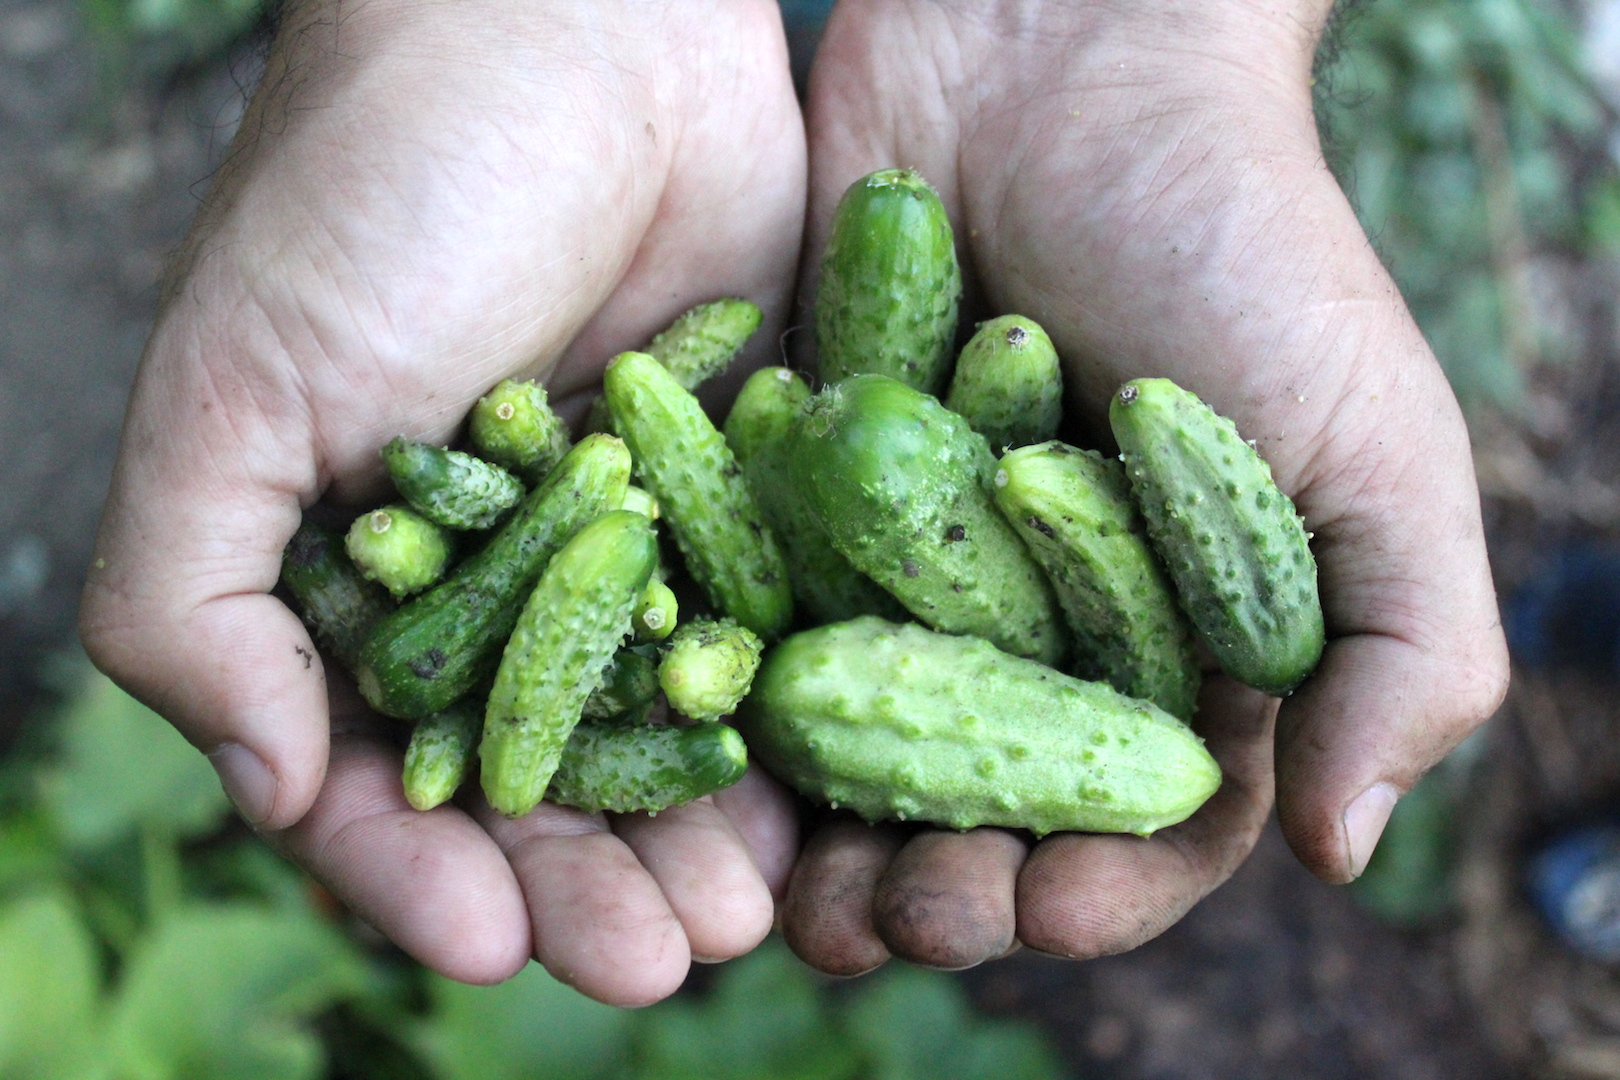 Harvesting Cucumbers for Gherkins